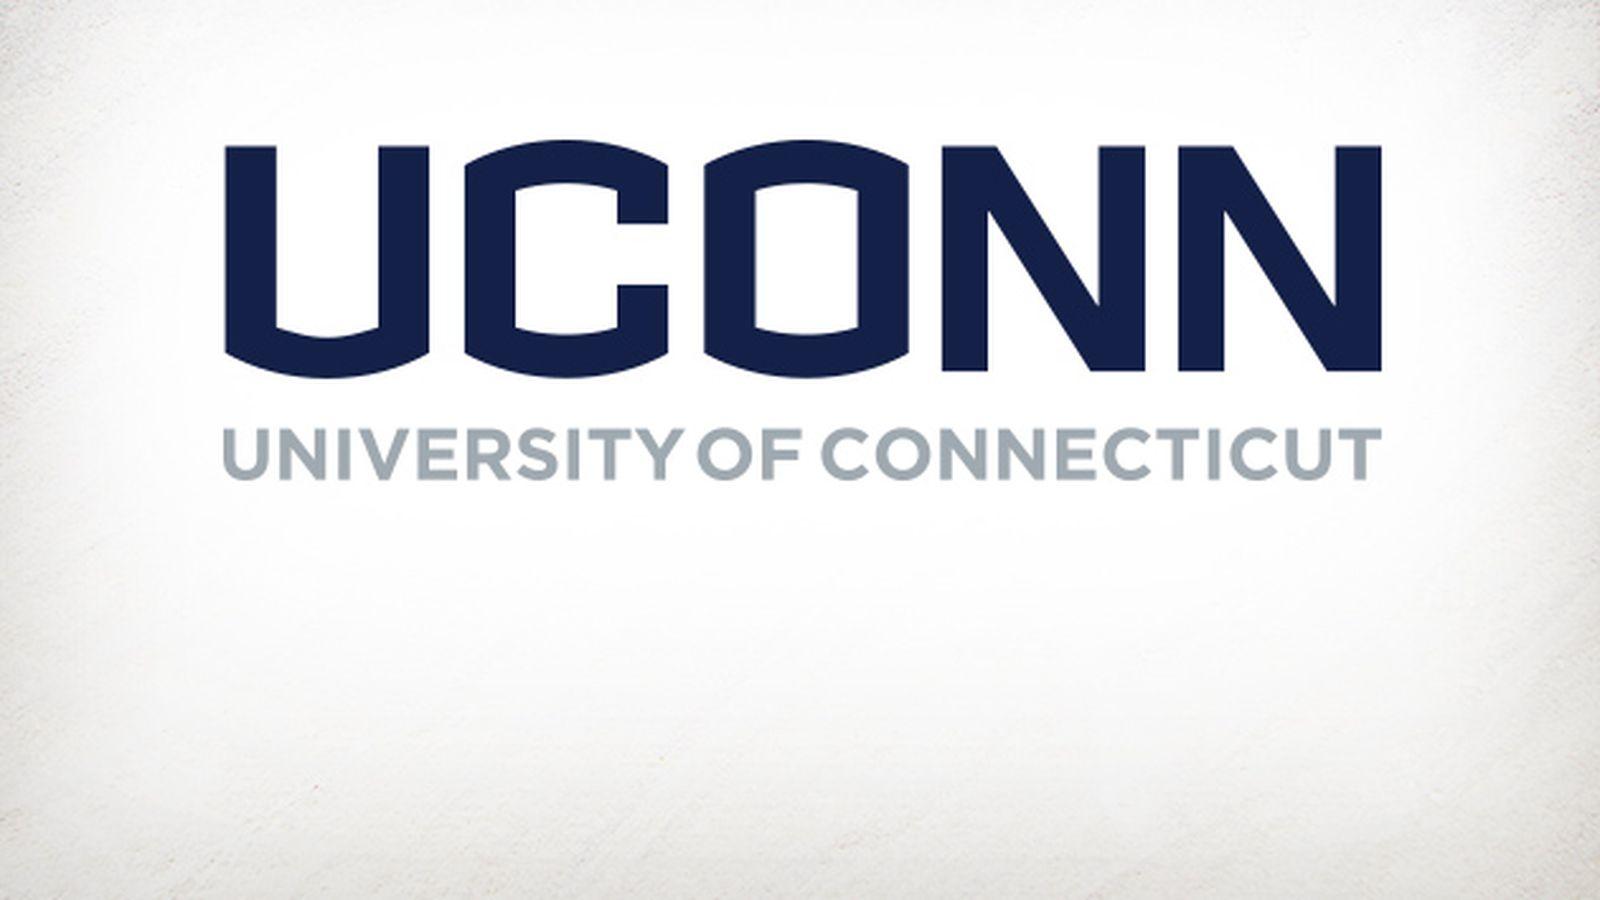 Uconn Logo Wallpaper One Brand Uconn Unveils